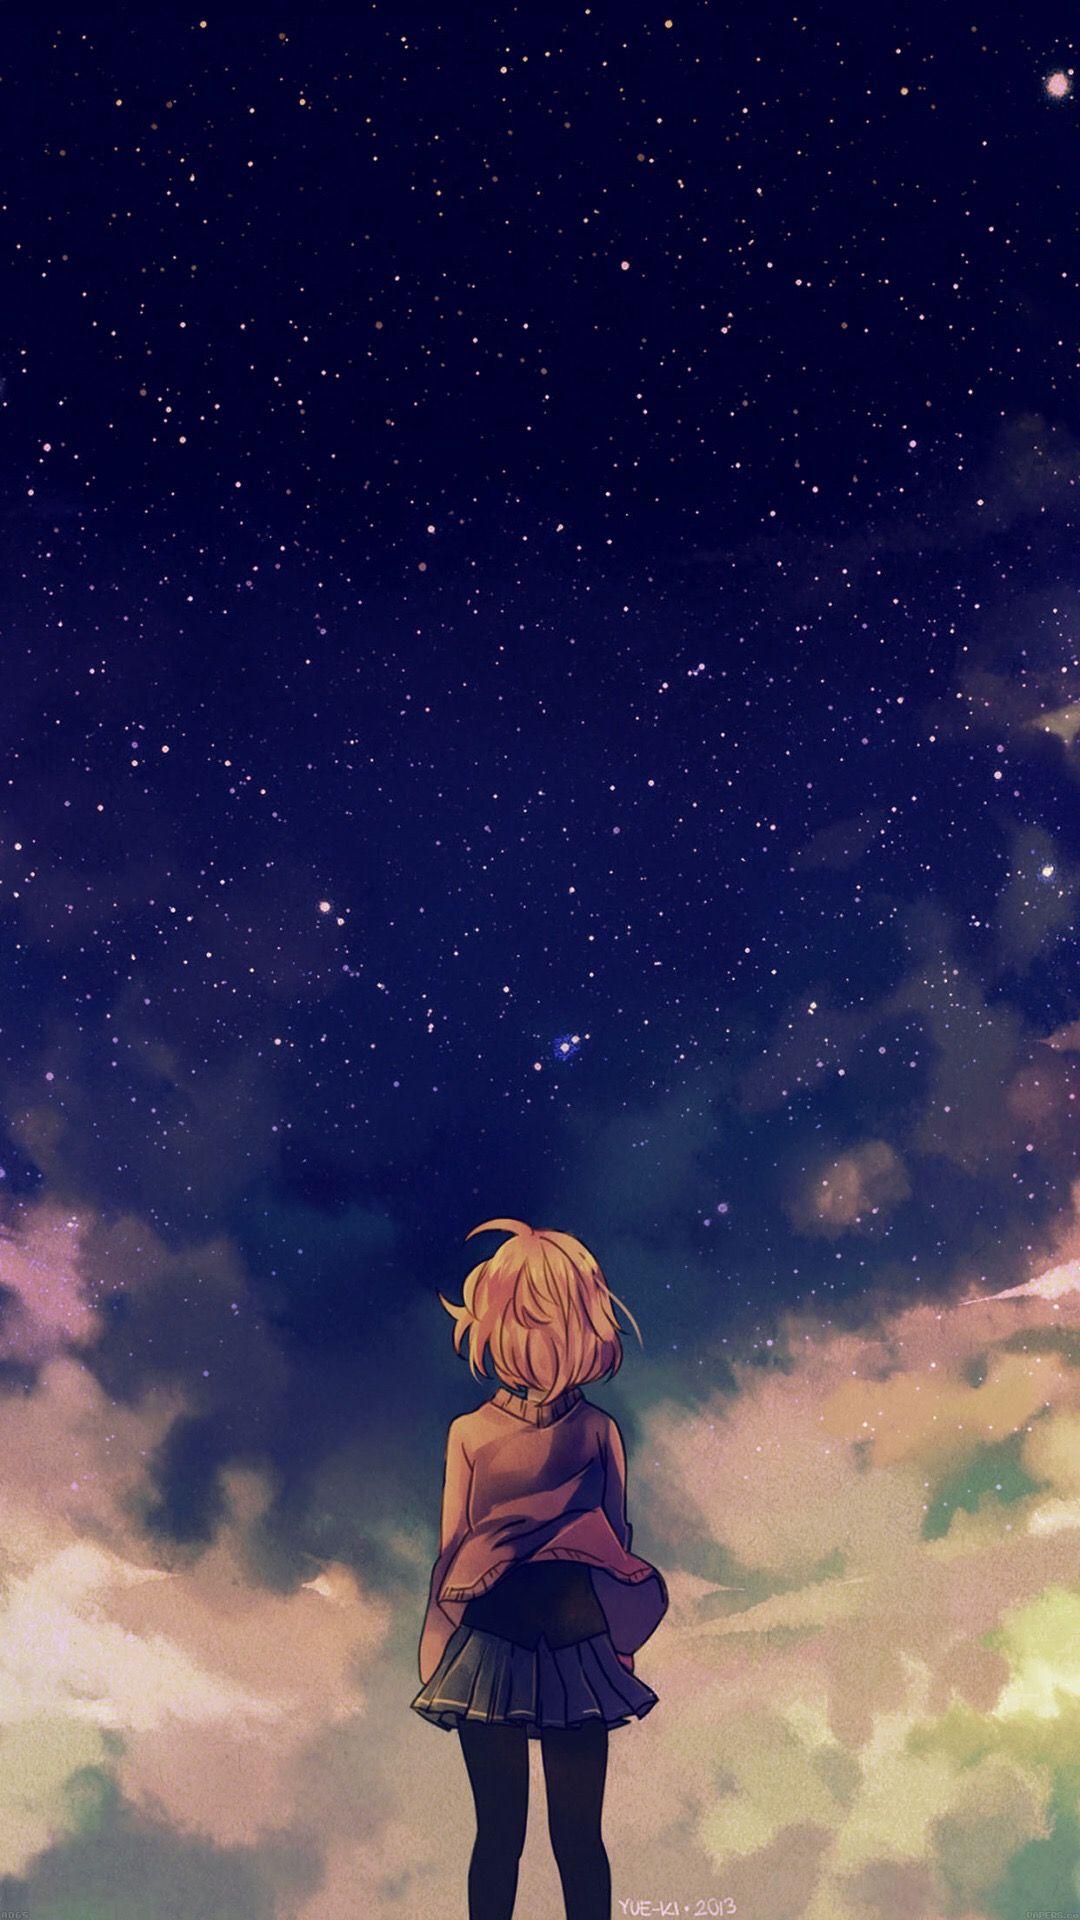 Download Wallpaper Anime Phone Hd Cikimm Com